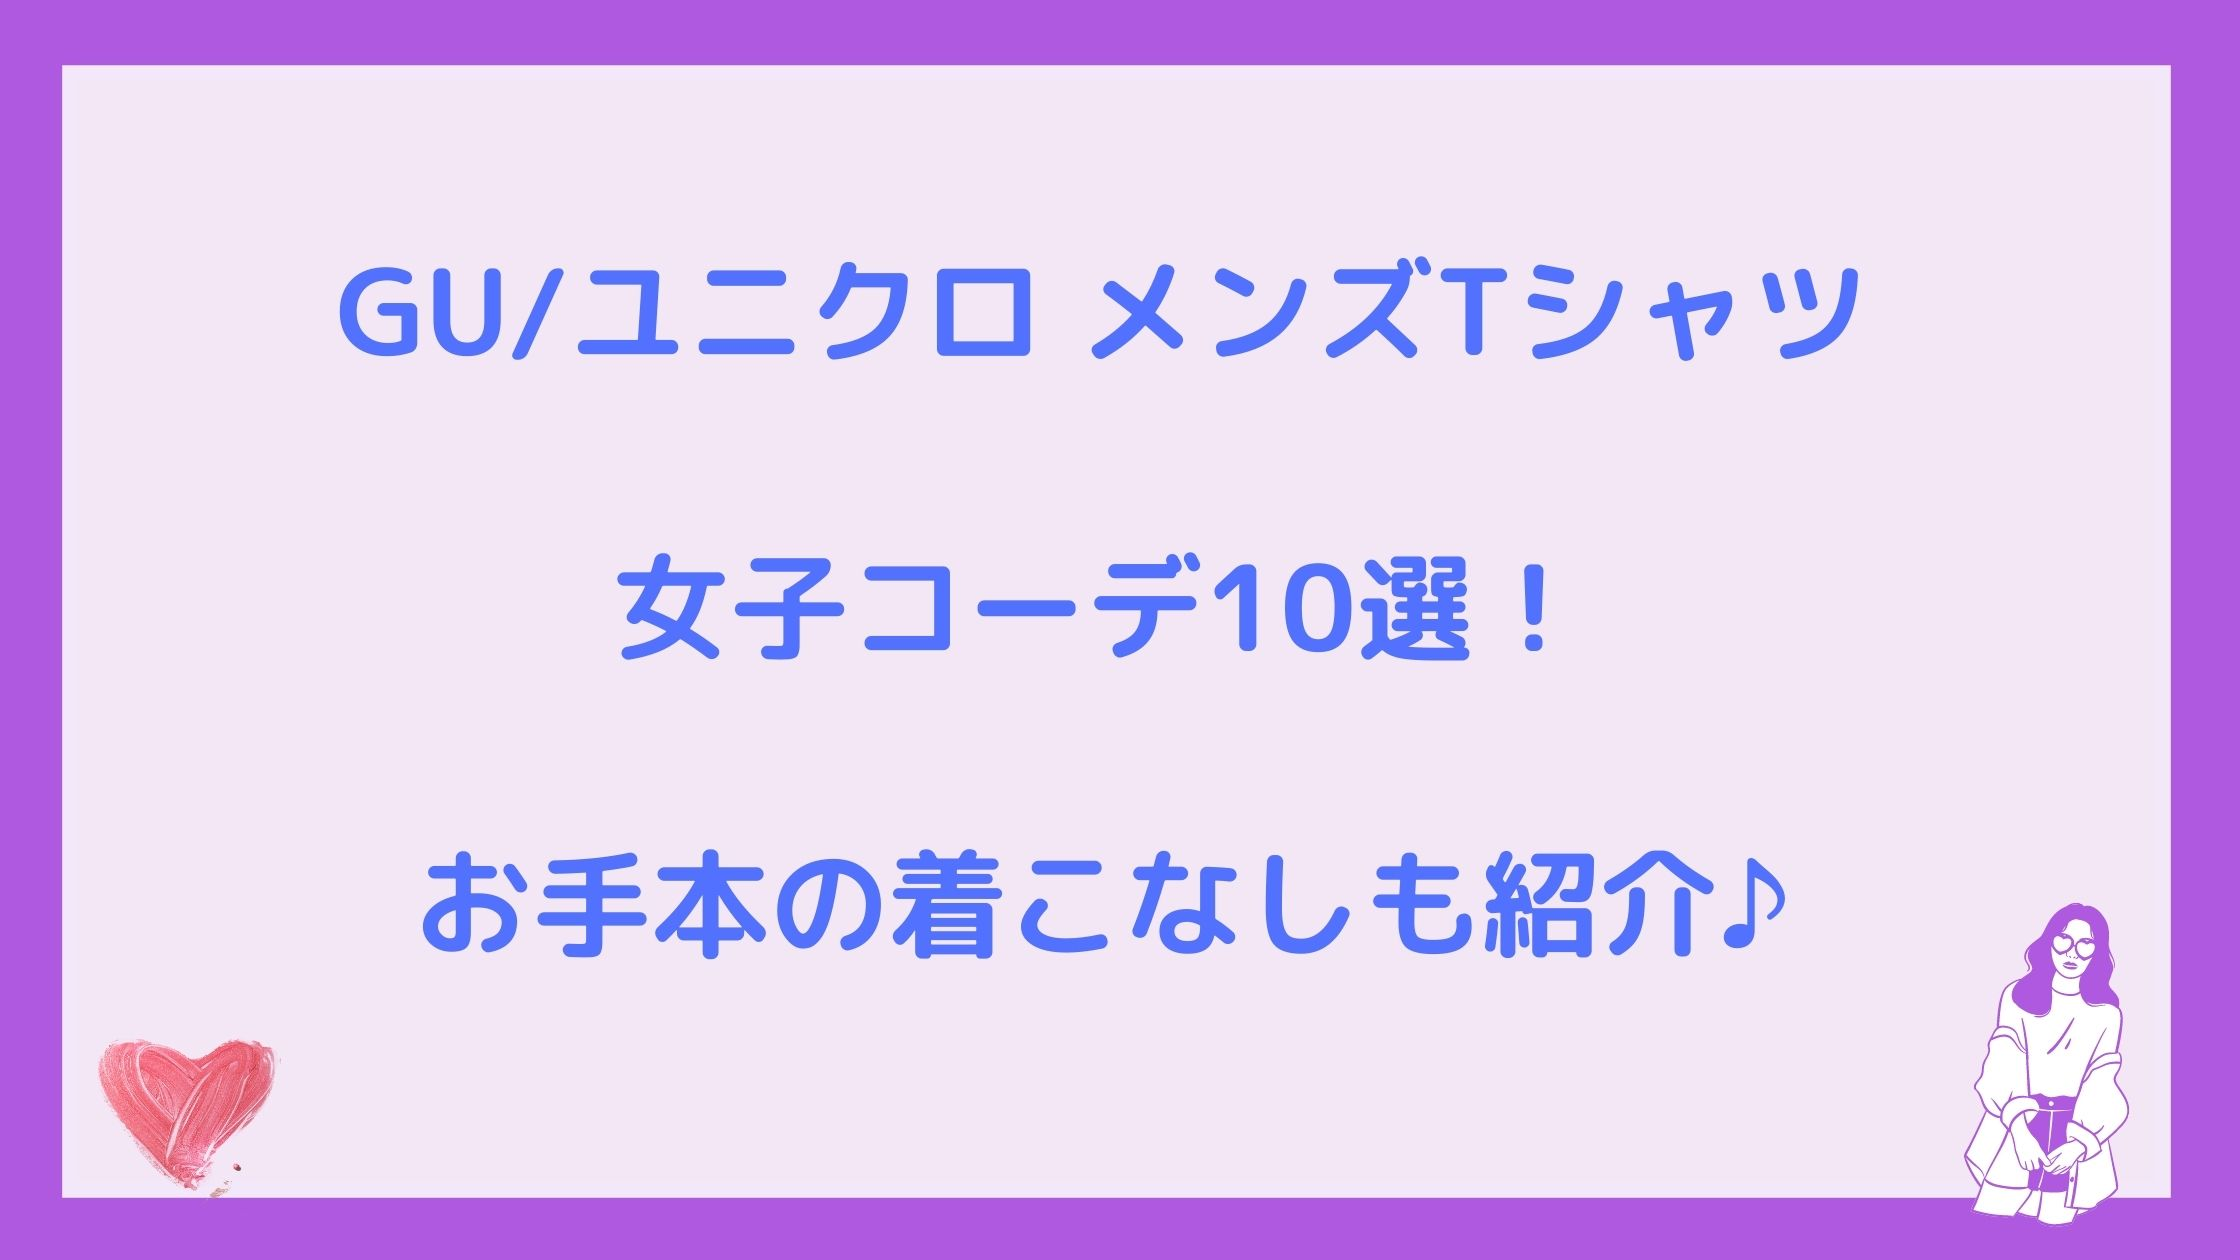 GU:ユニクロメンズtシャツ女子コーデ10選!お手本の着こなしも紹介♪